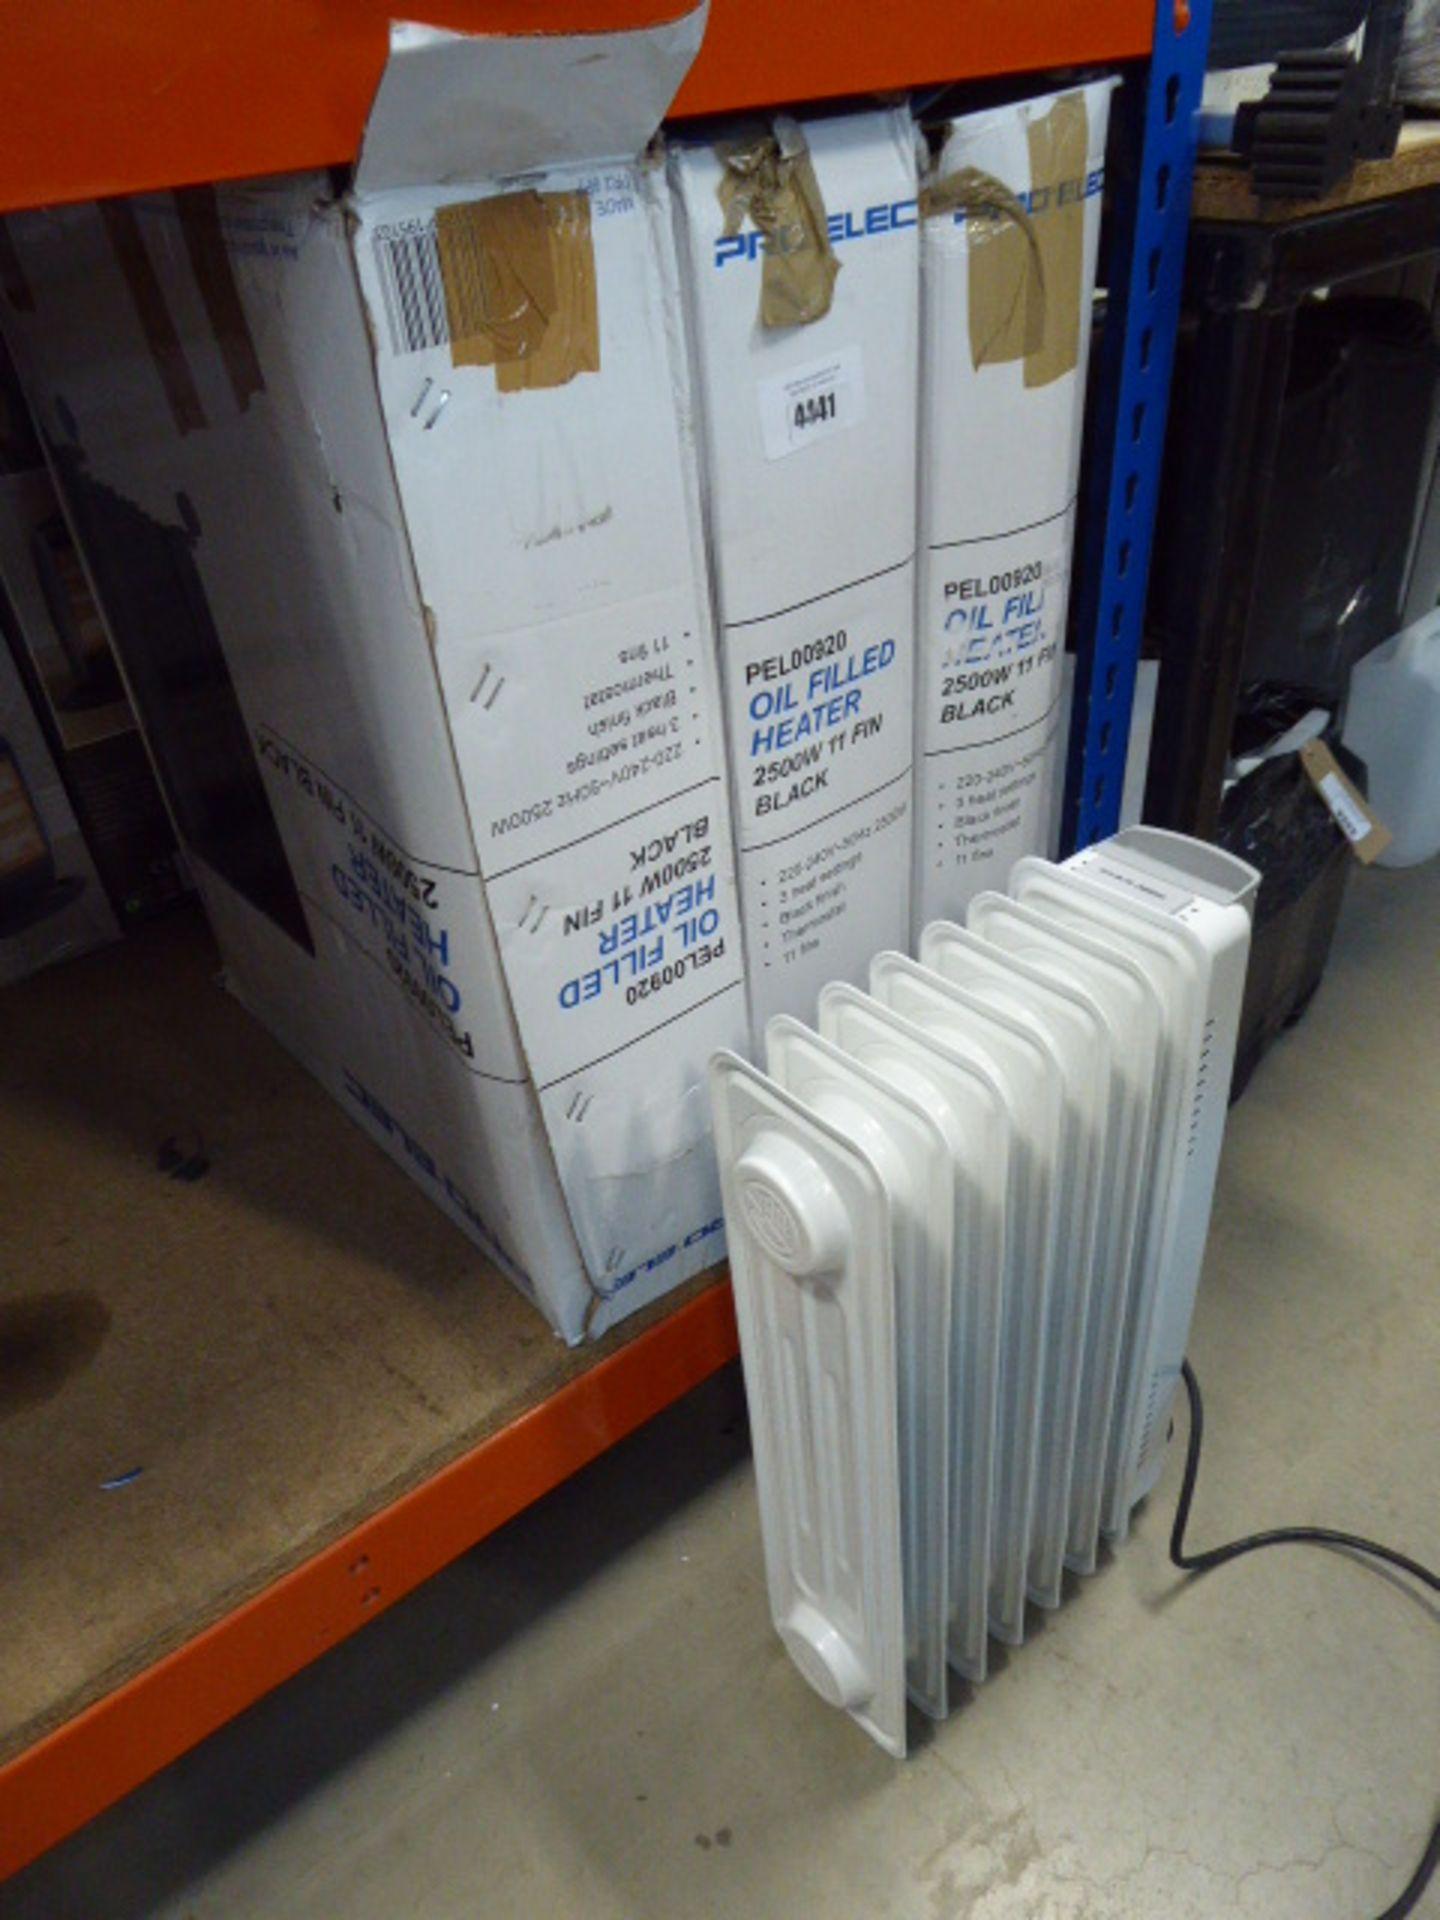 4 Pro-Elec oil filled radiators